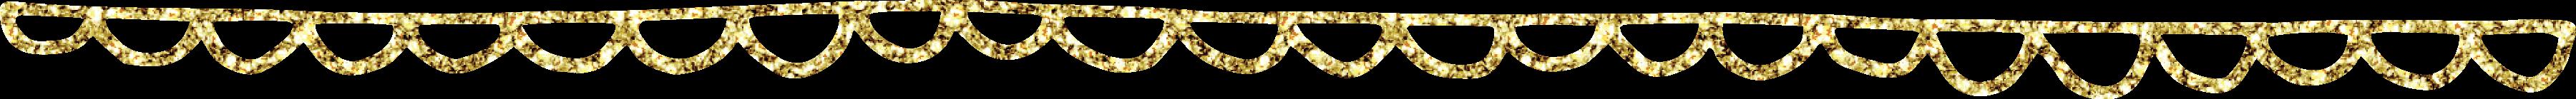 GoldGlitterDoodleBorders-06